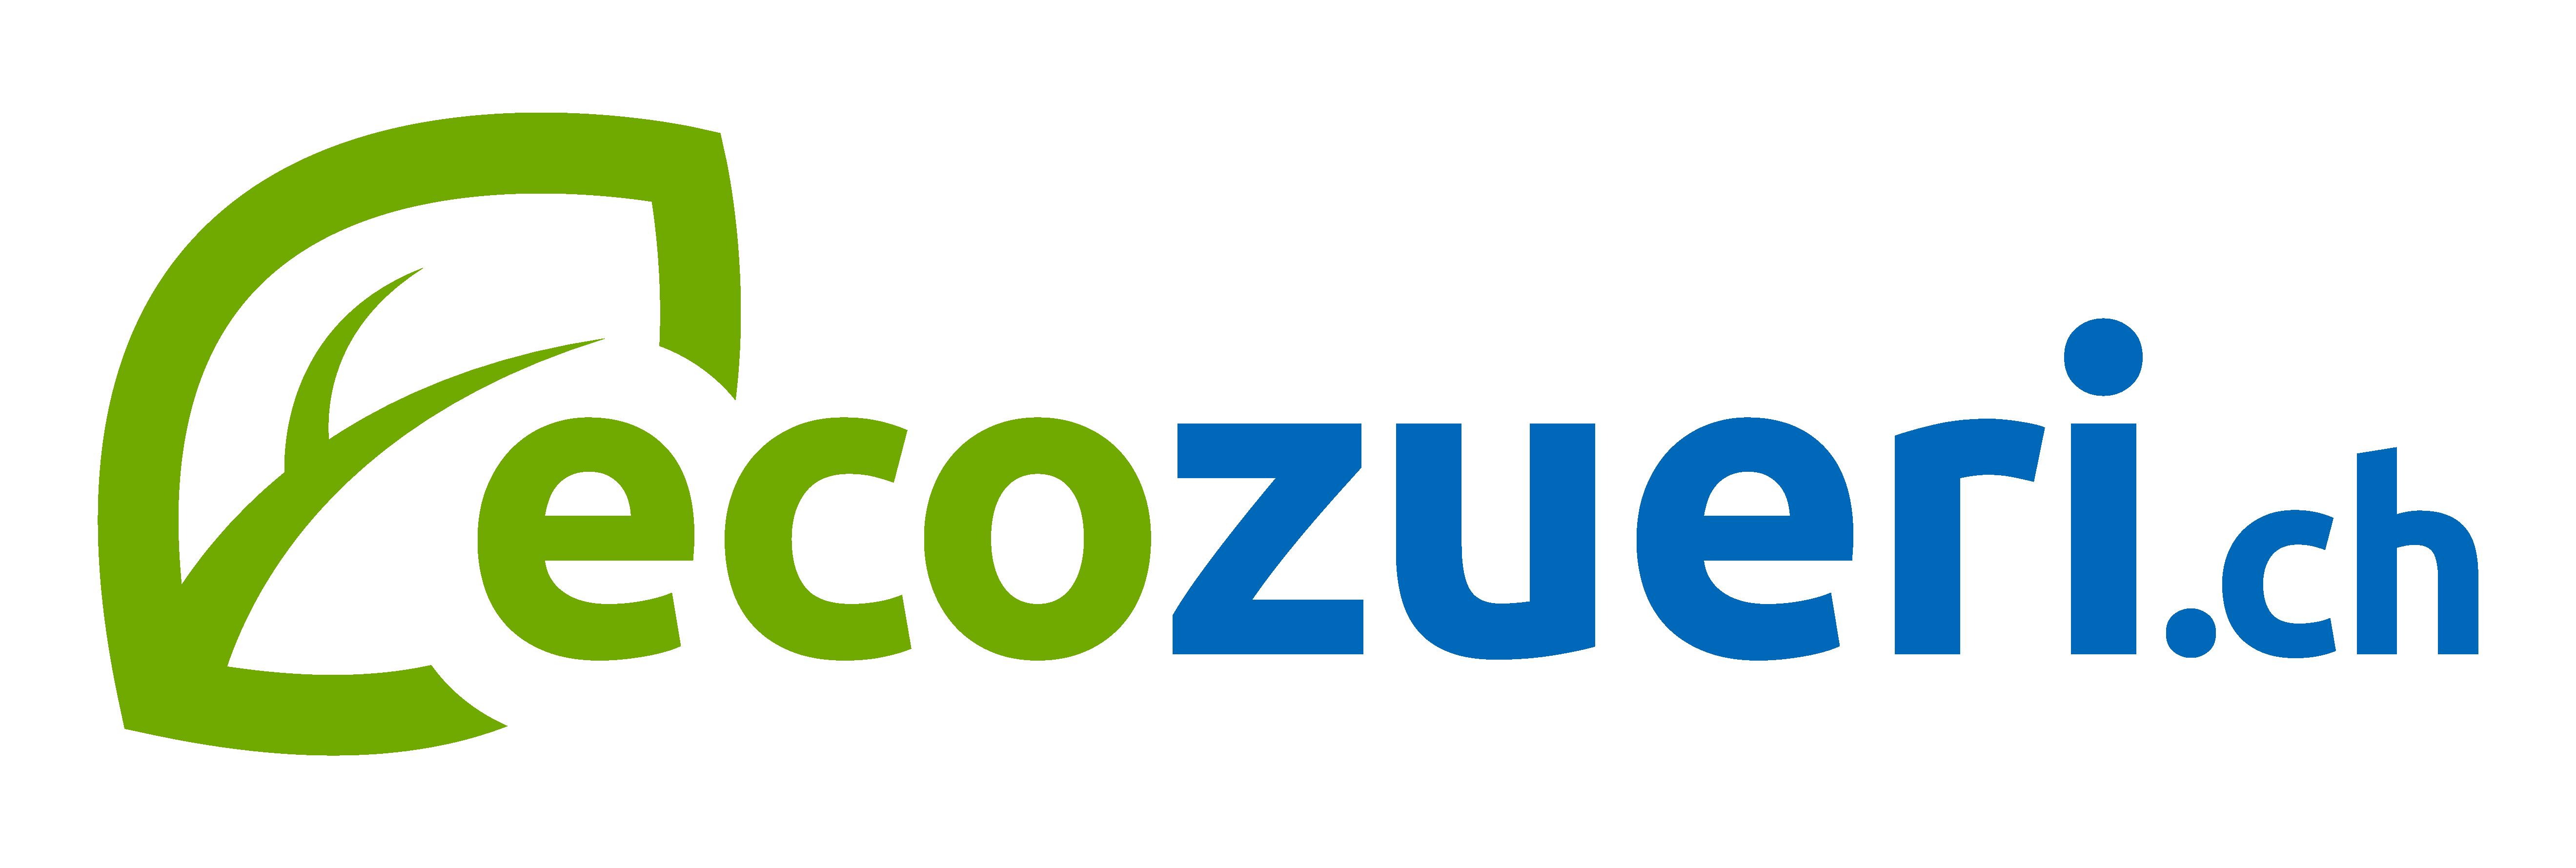 ecozueri.ch